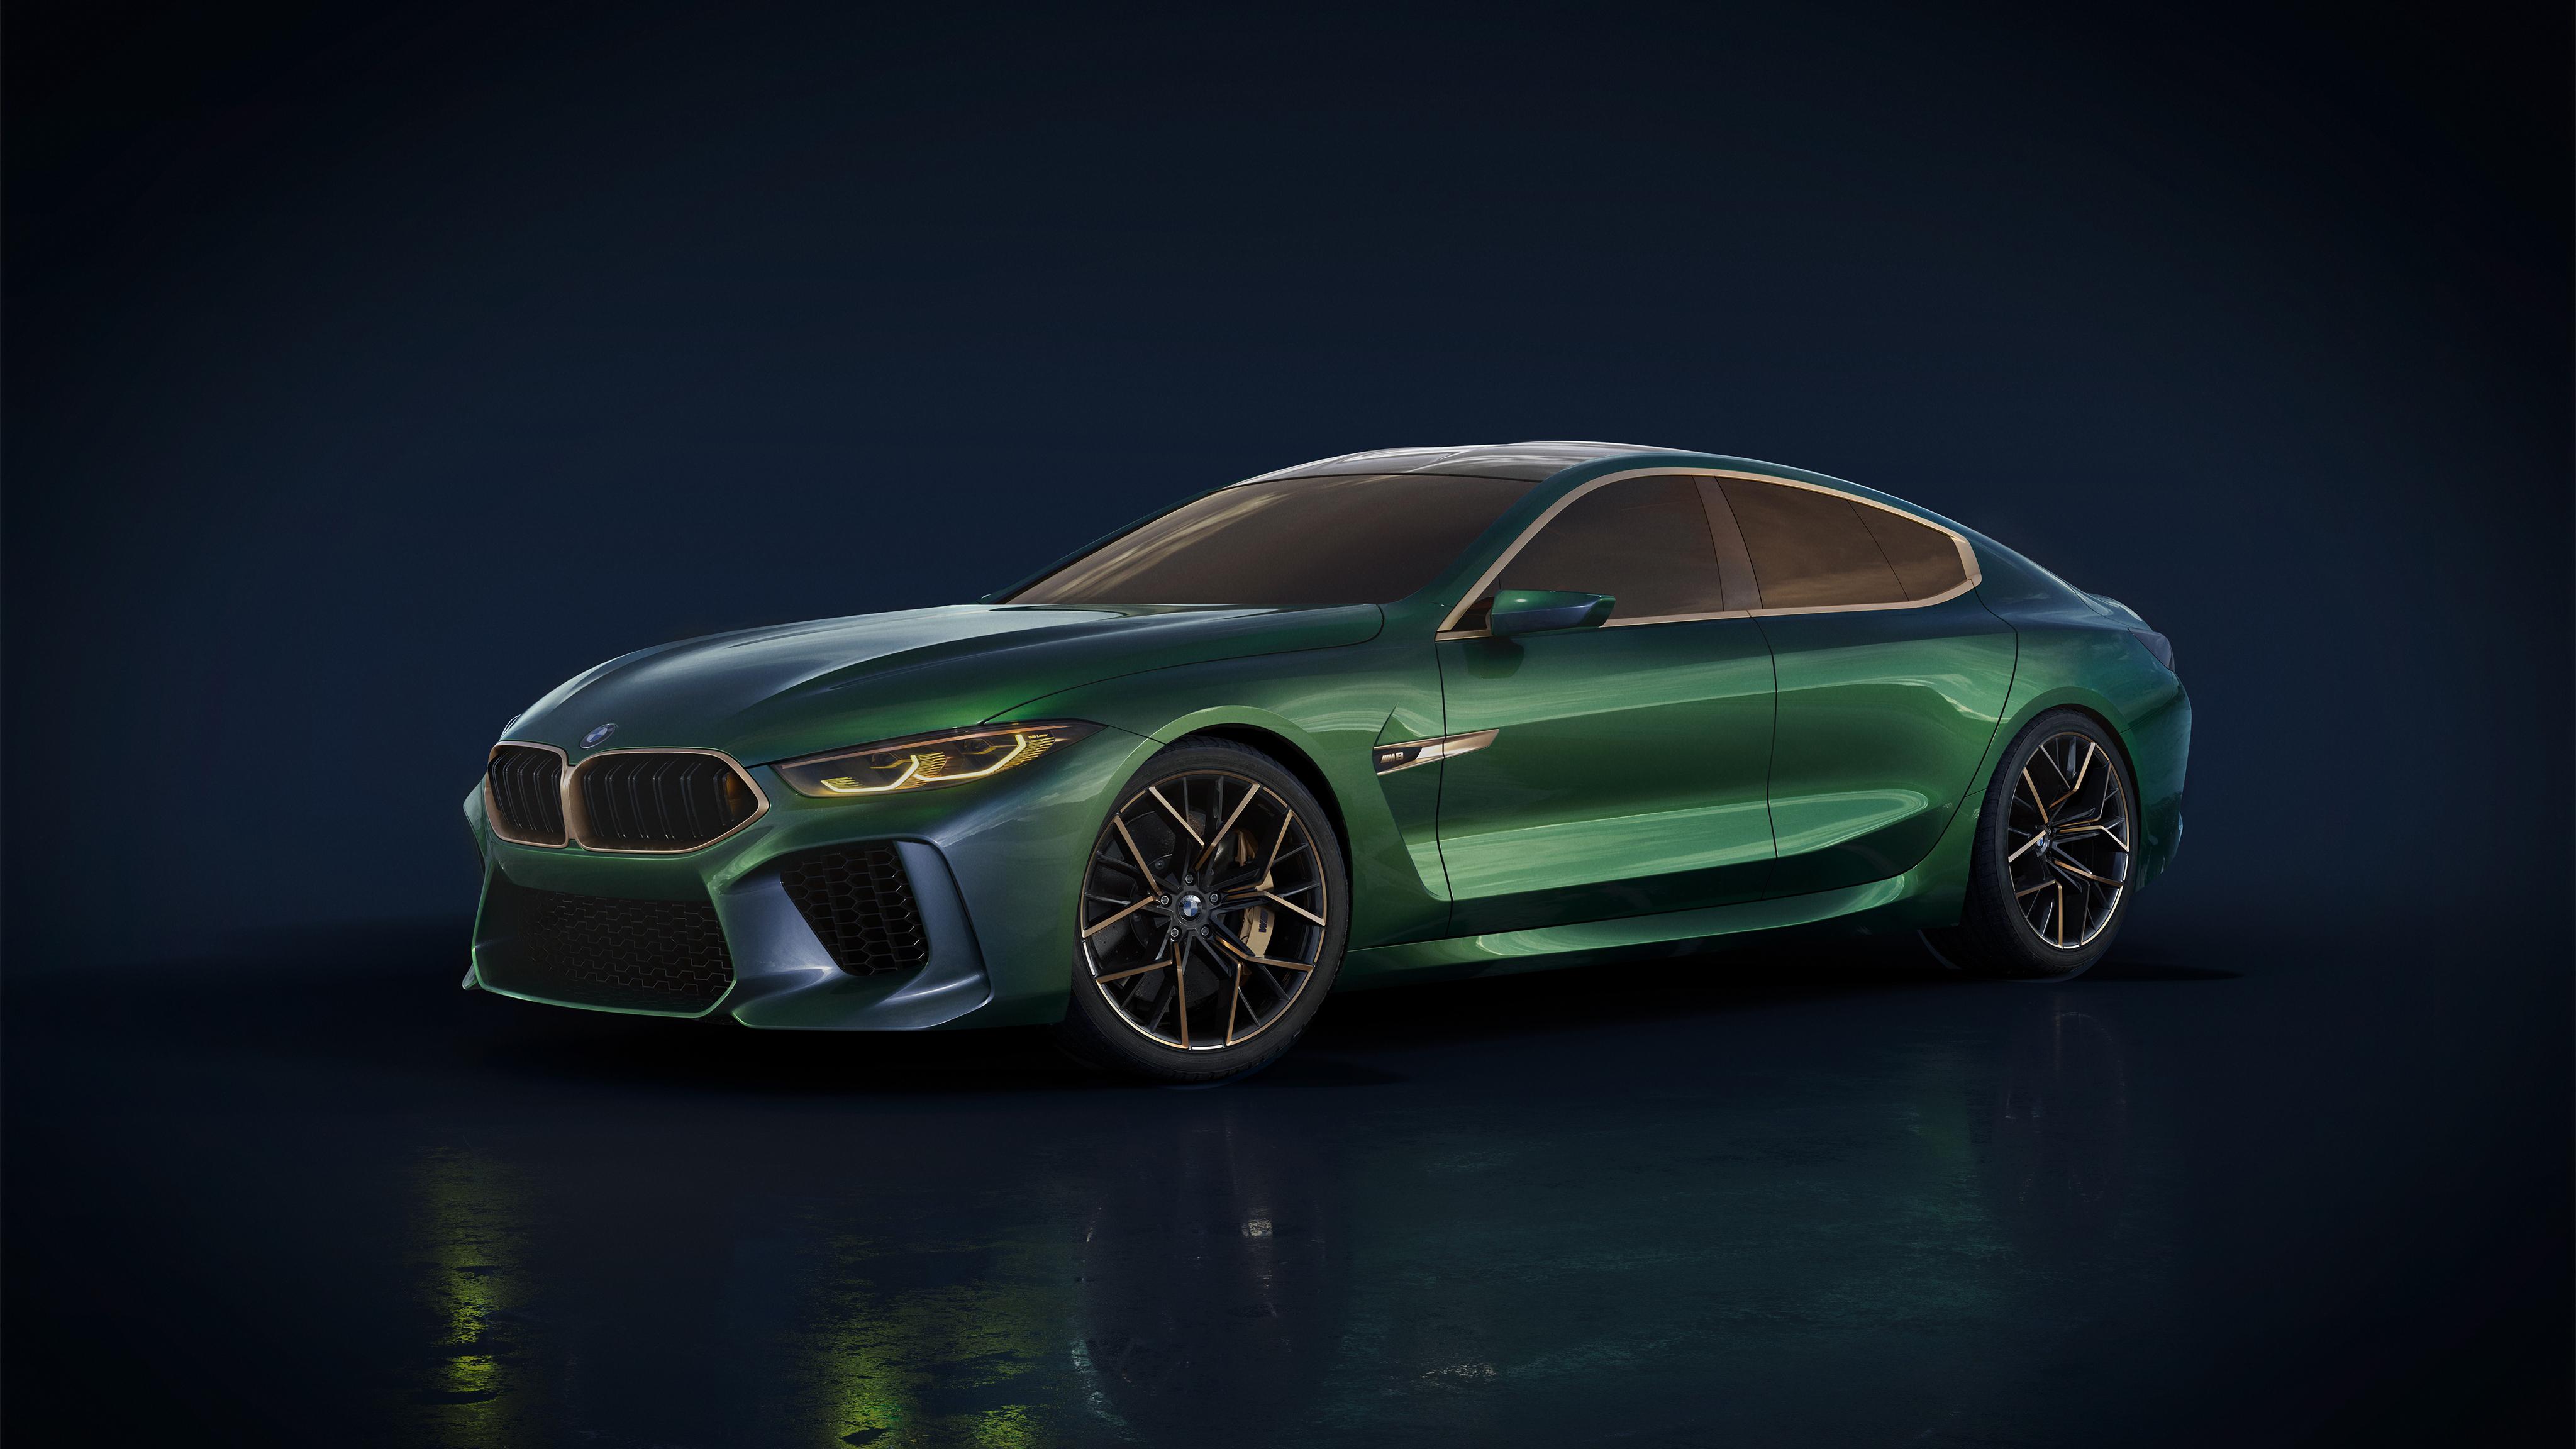 2018 Bmw Concept M8 Gran Coupe 4k 3 Wallpaper Hd Car